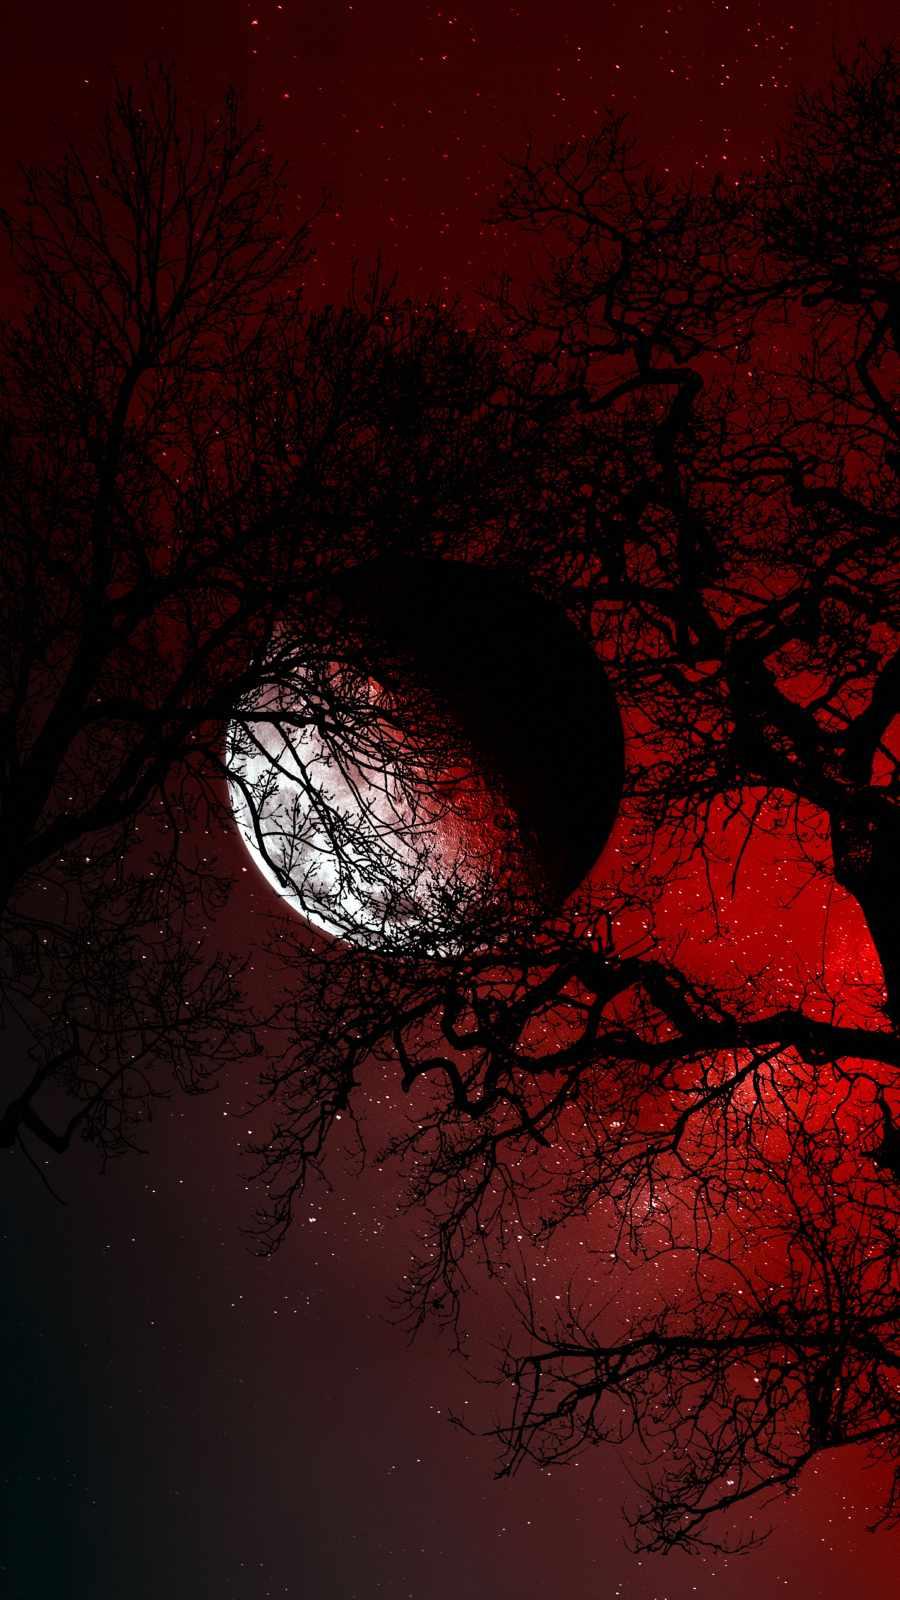 Moon Hiding in Tree